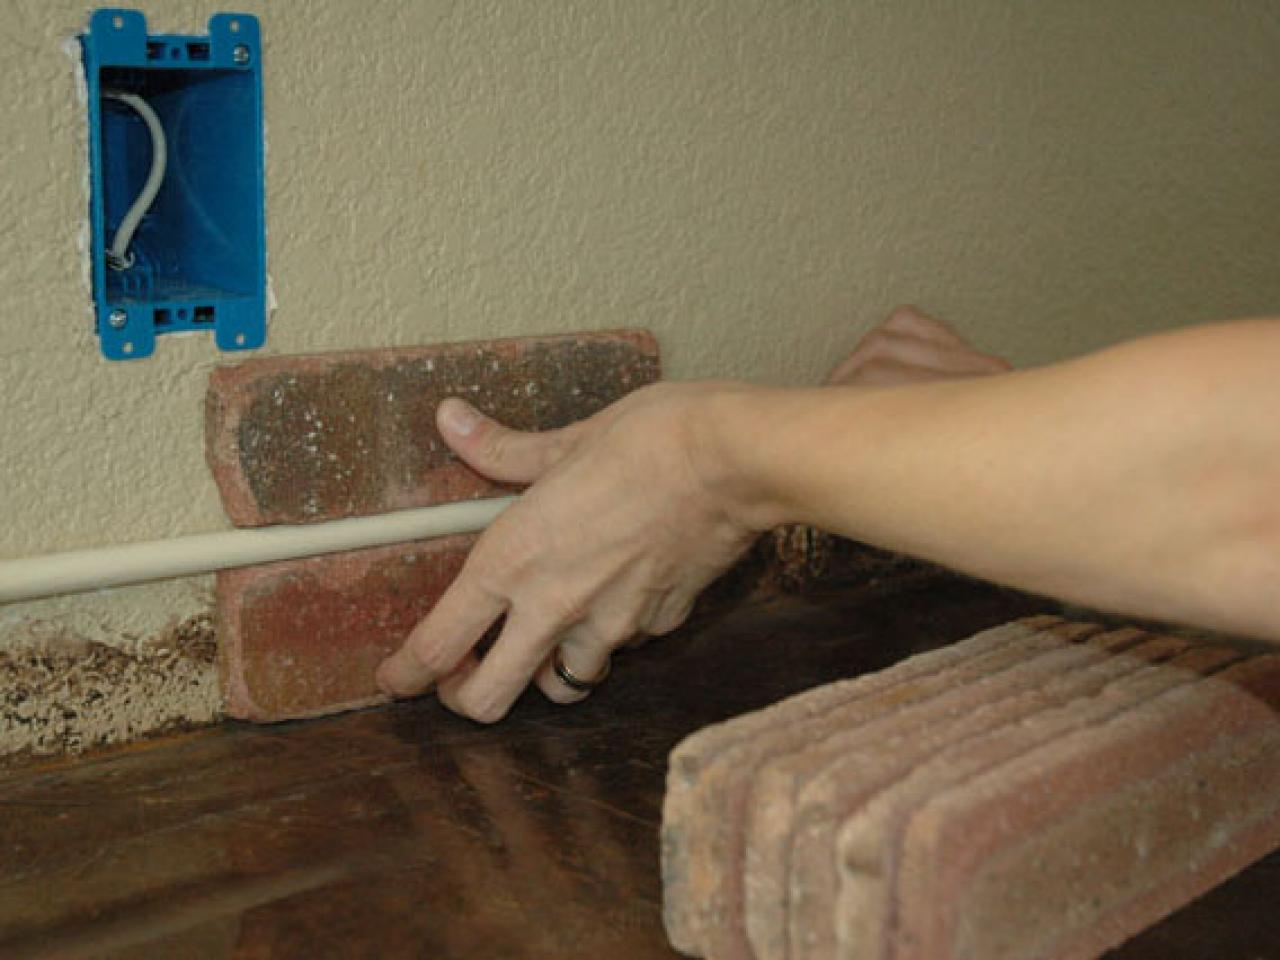 Brick tiles for backsplash in kitchen - Dseq201_3fa_brickpattern01